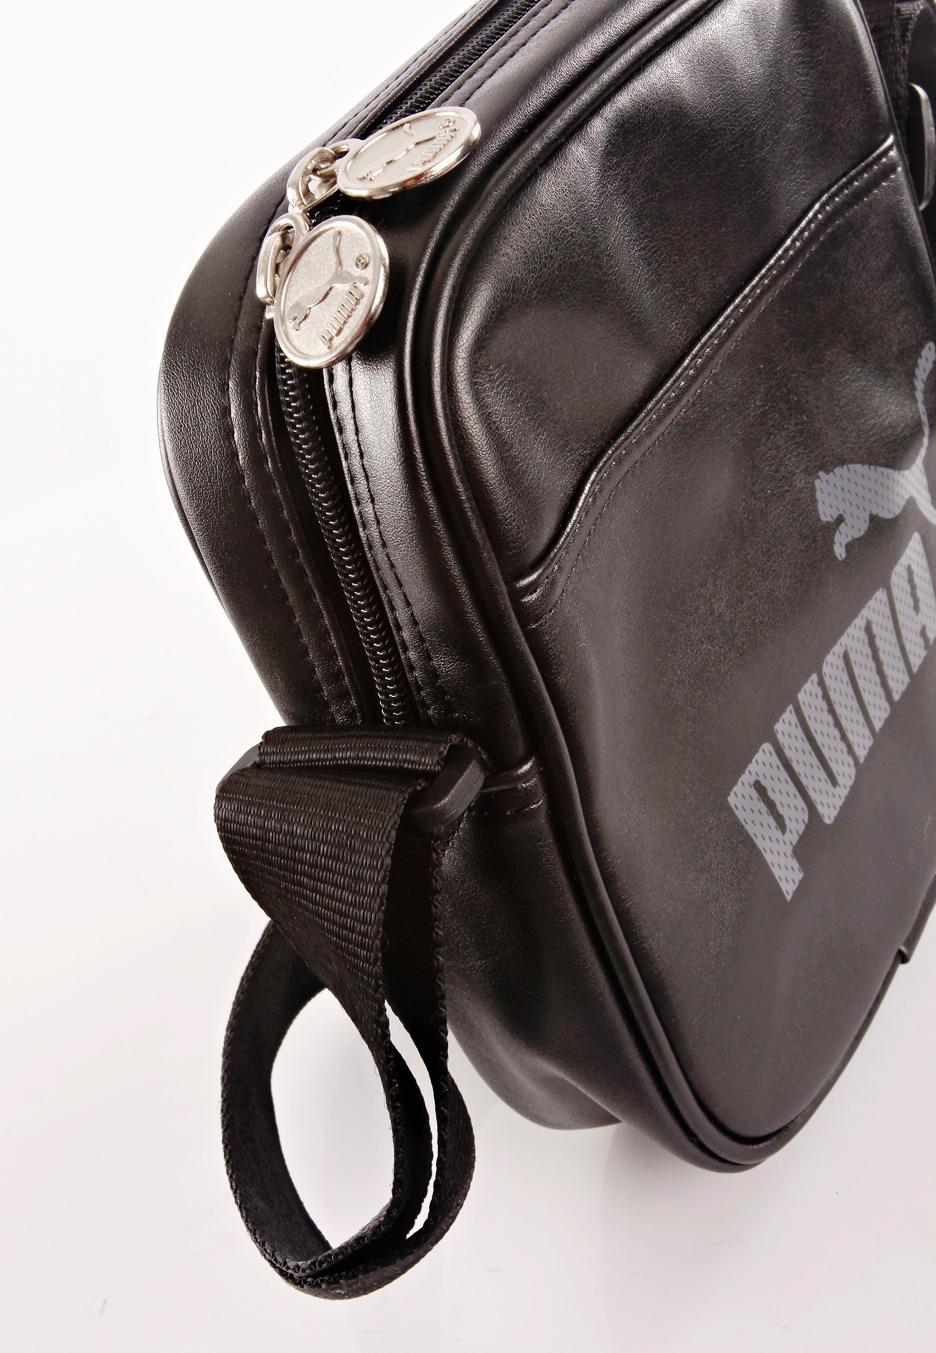 Puma - Campus Portable Black Black Steel Grey - Bag - Impericon.com ... 0786f0c69b